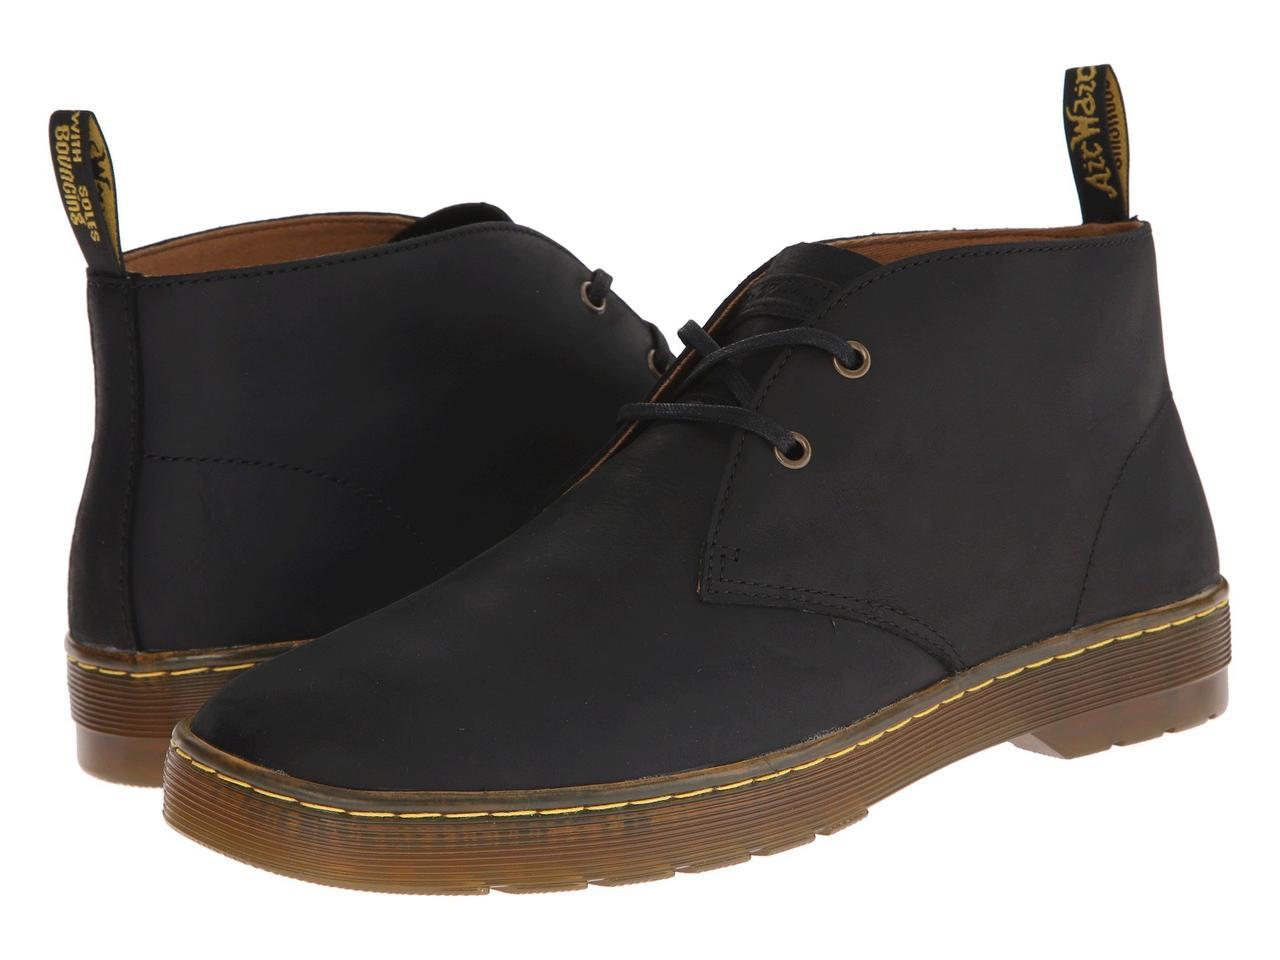 Ботинки Сапоги (Оригинал) Dr. Martens Cabrillo Black Wyoming - TopUSA